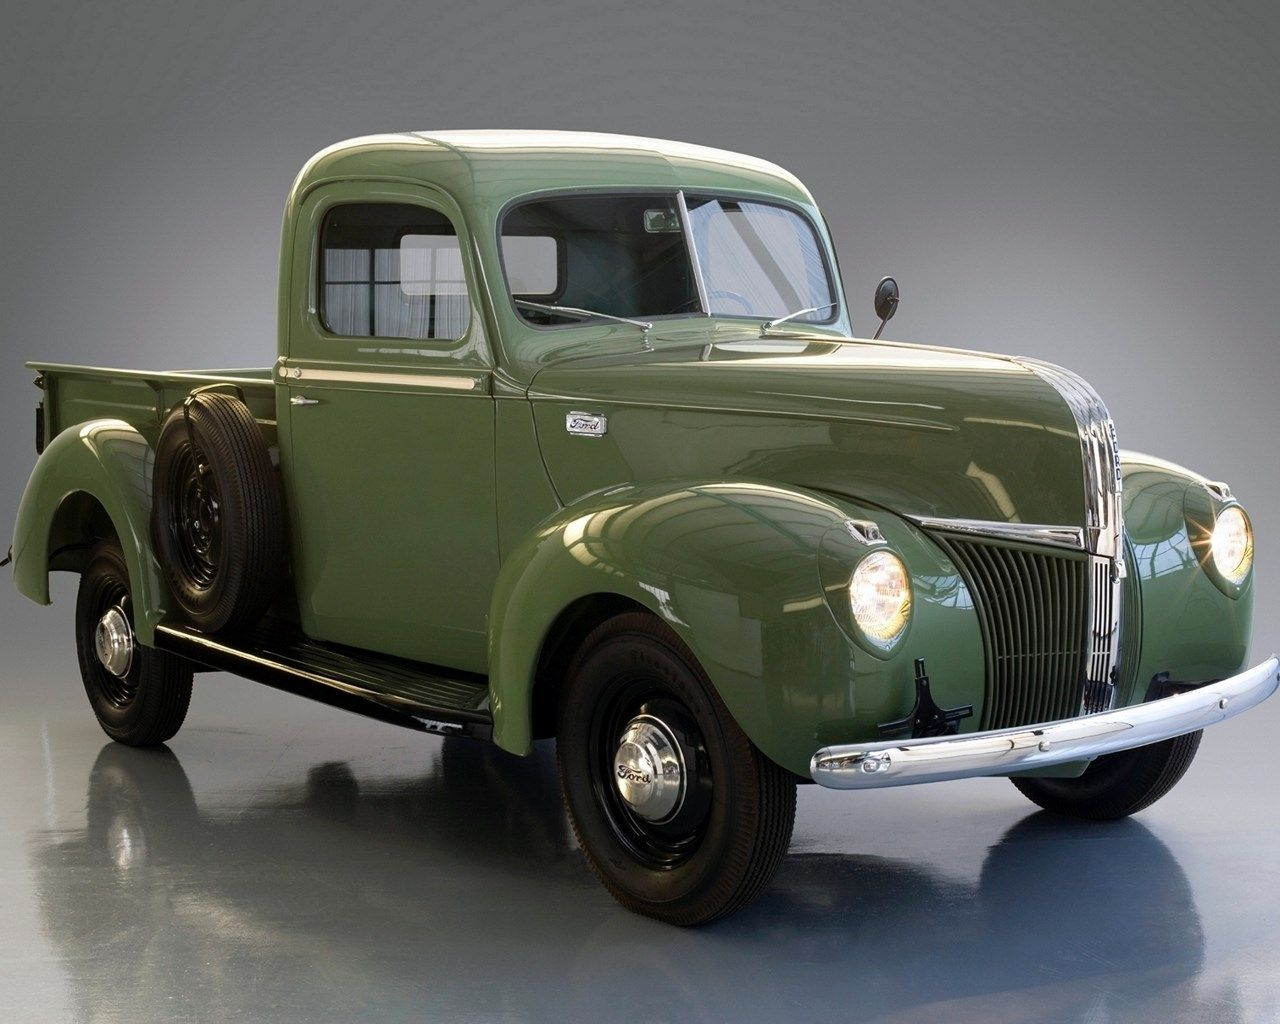 1280x1024 Free Desktop Wallpaper Downloads Classic Classic Pickup Trucks Ford Trucks Pickup Trucks